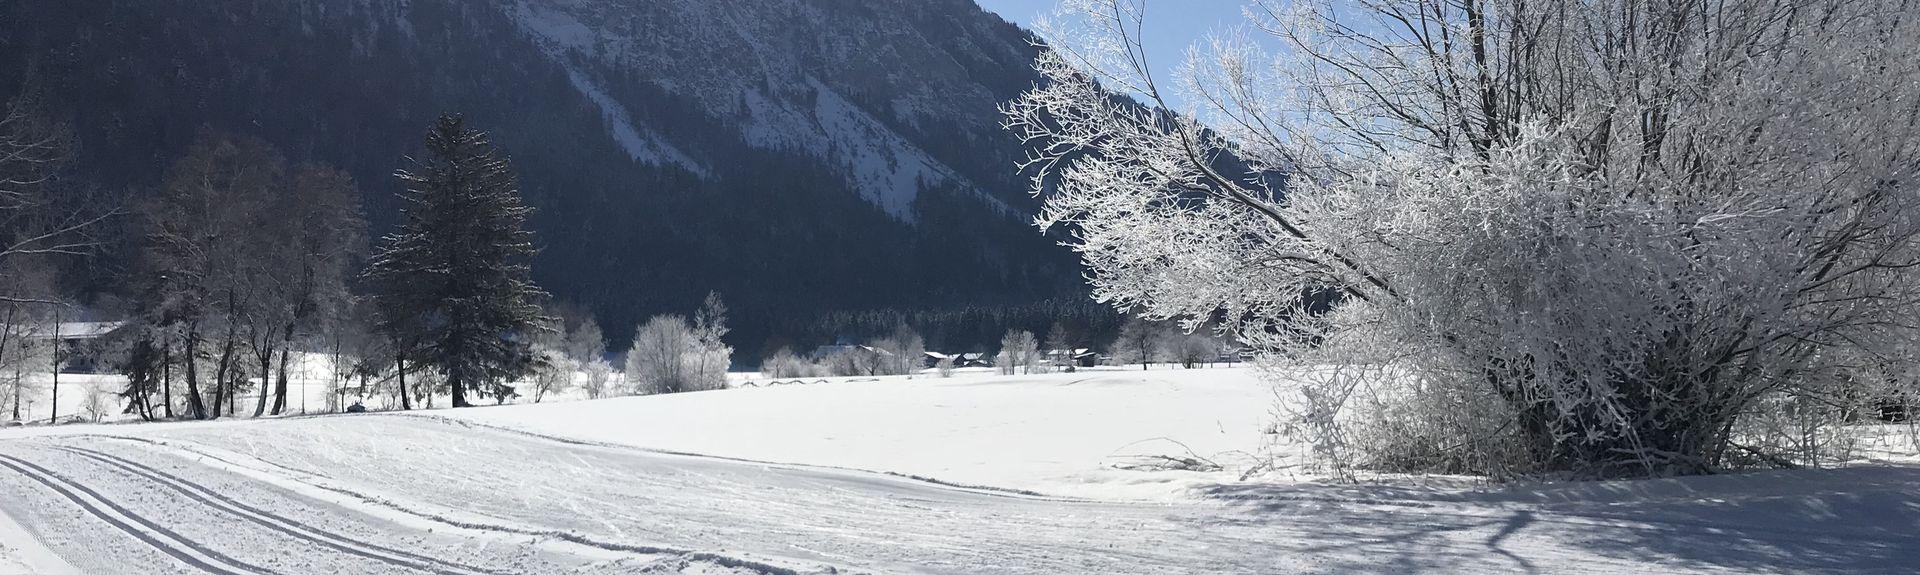 Ramsau bei Berchtesgaden, Germany